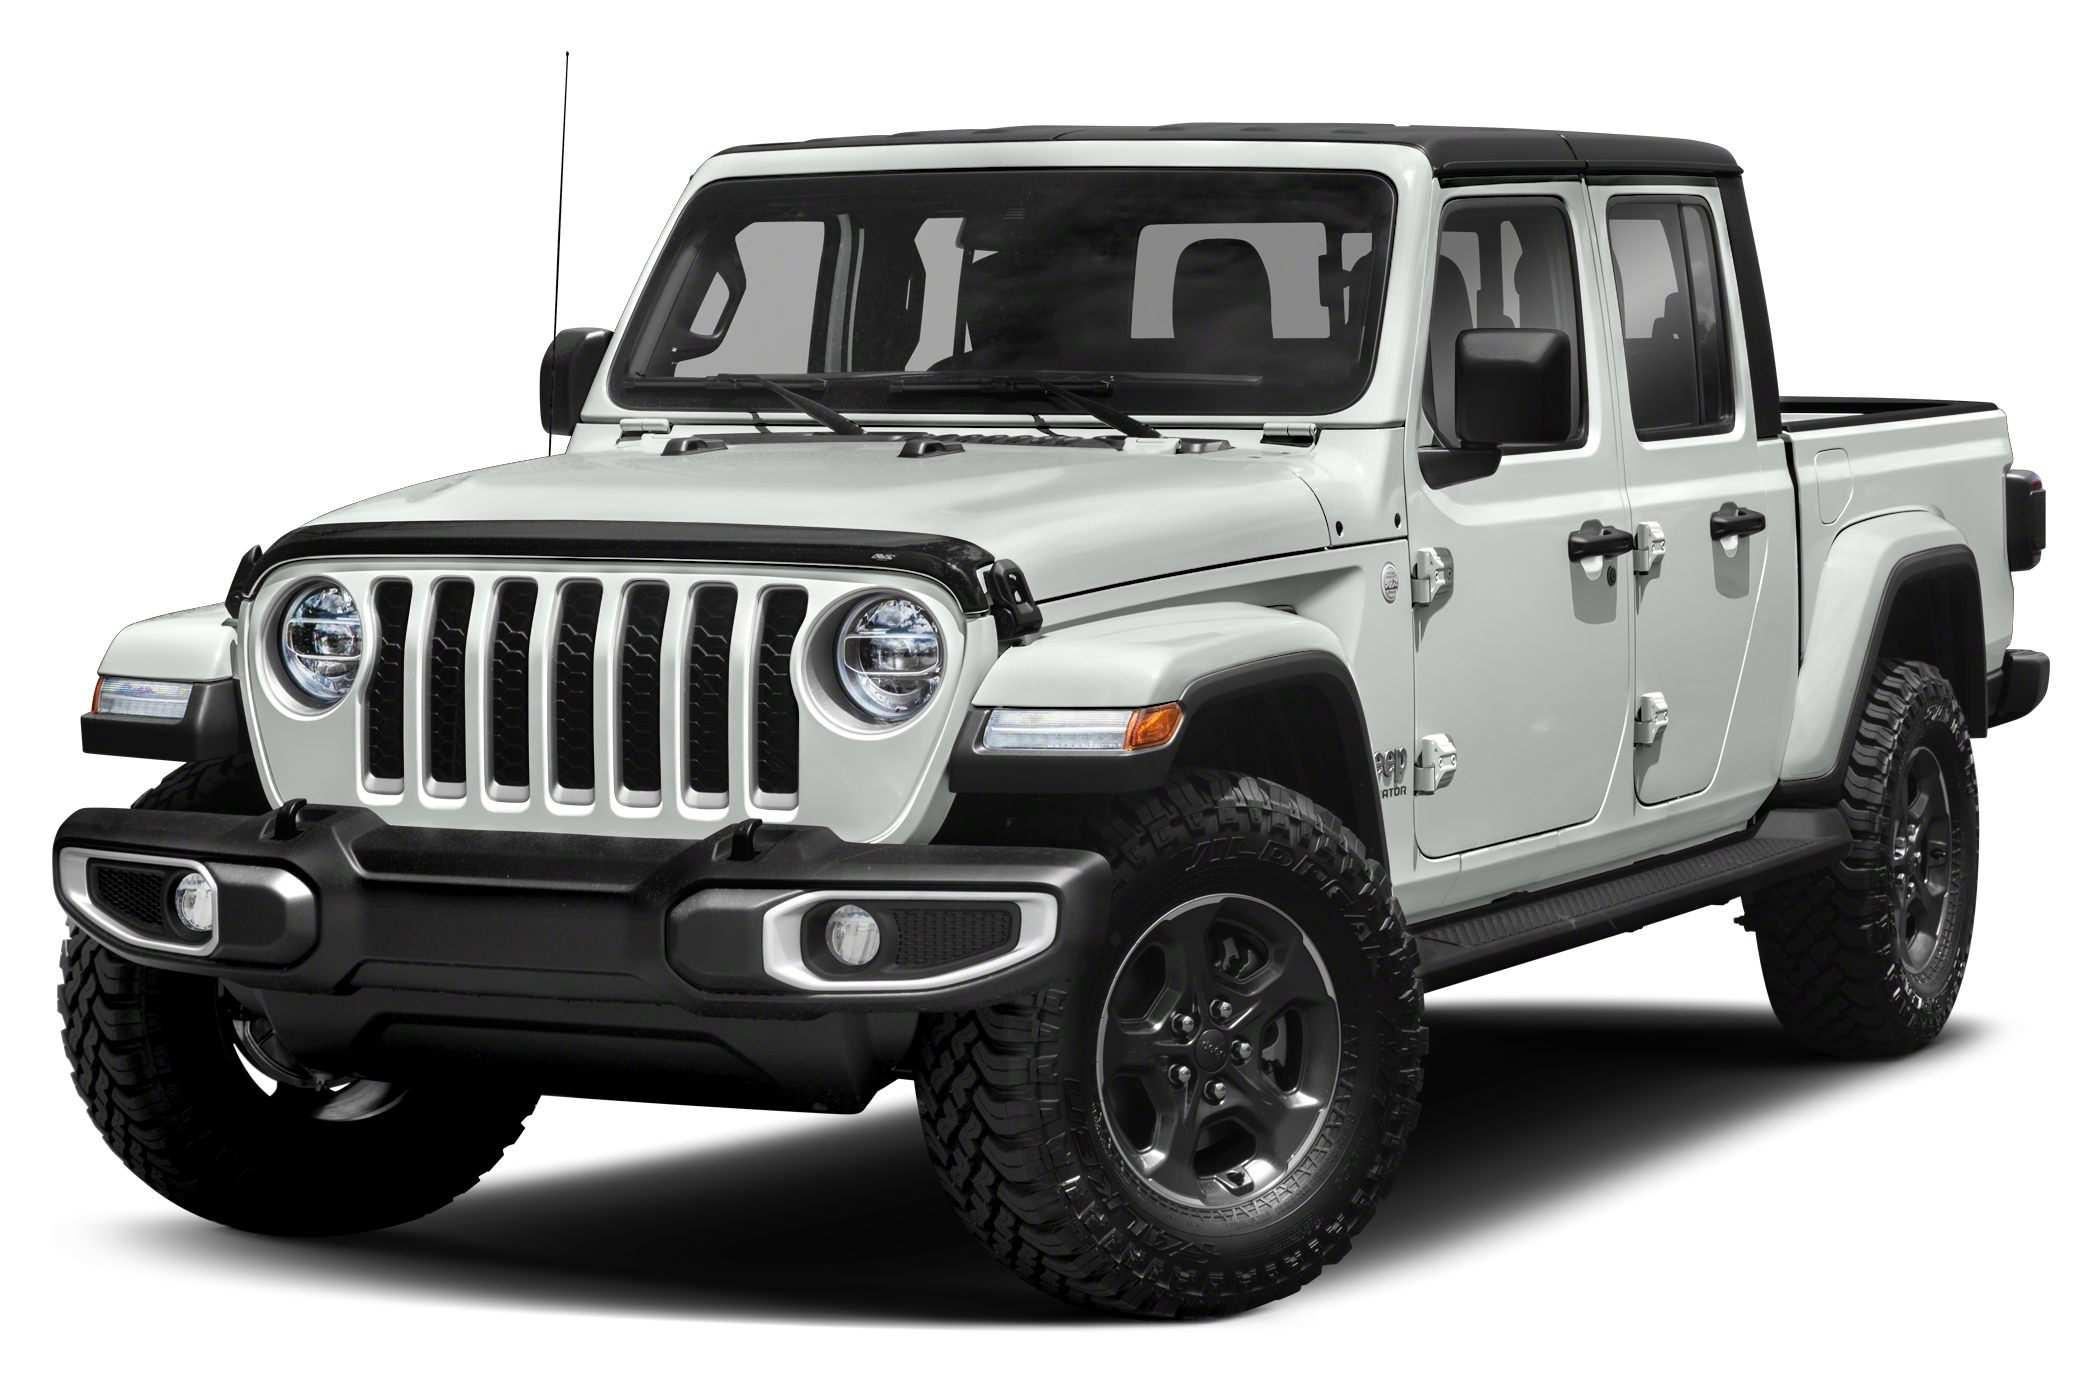 53 All New Jeep Islander 2020 Price for Jeep Islander 2020